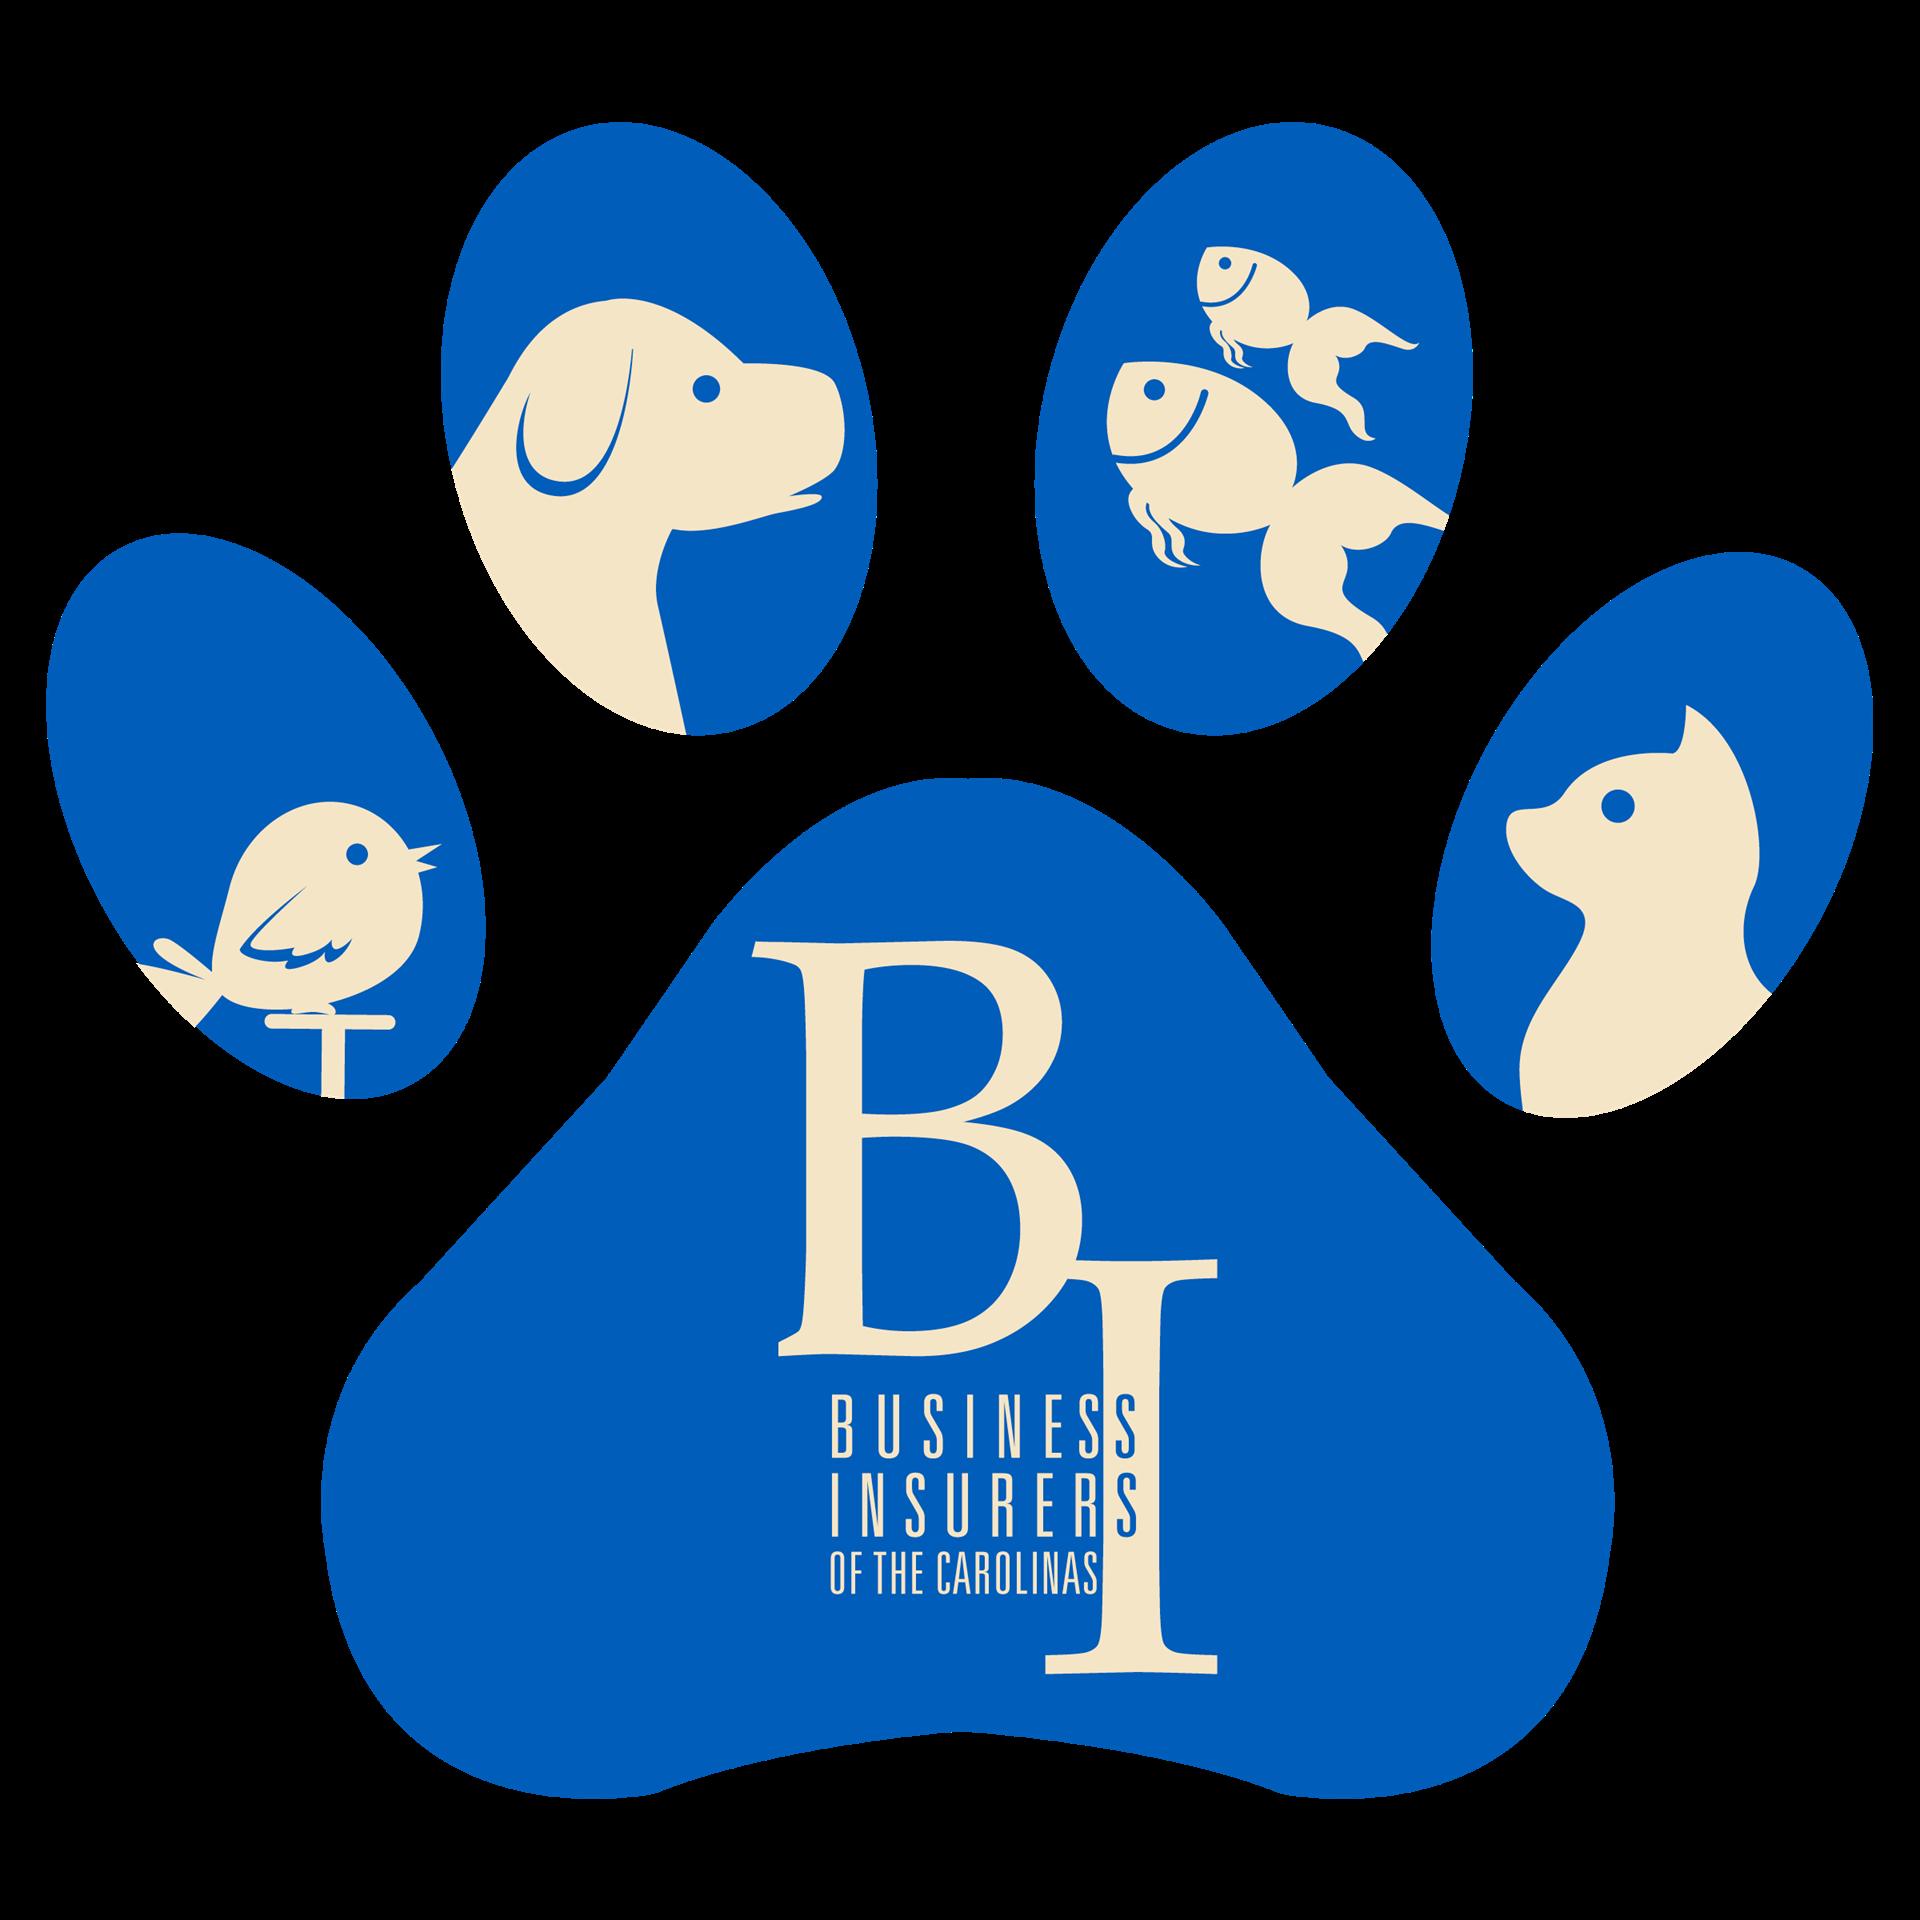 Professional clipart business partner. The pet guild corporate